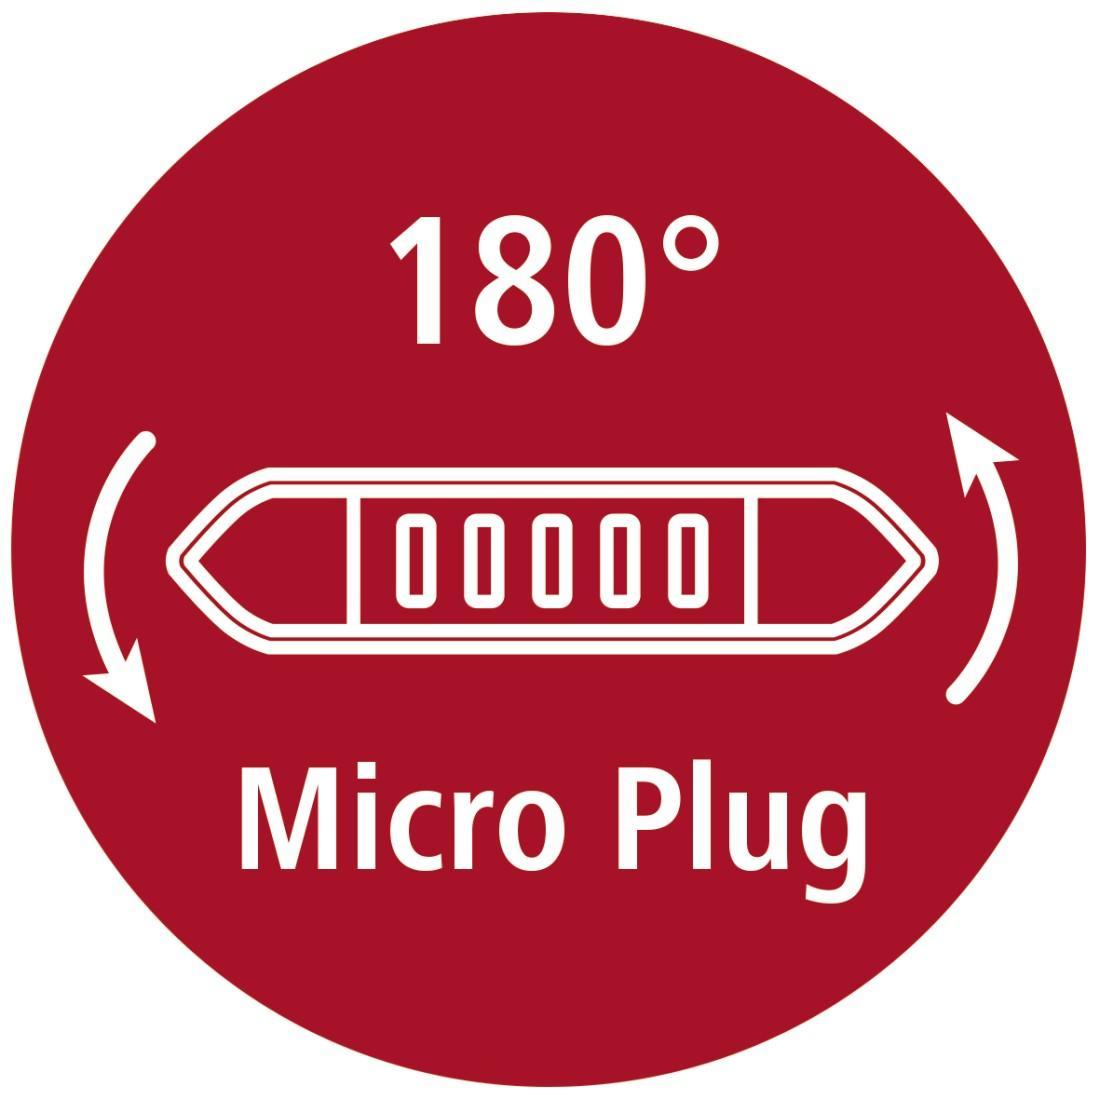 Кабел HAMA Flexi-Slim 135700 Micro USB, 0.75 м., Позлатени конектори, Черен